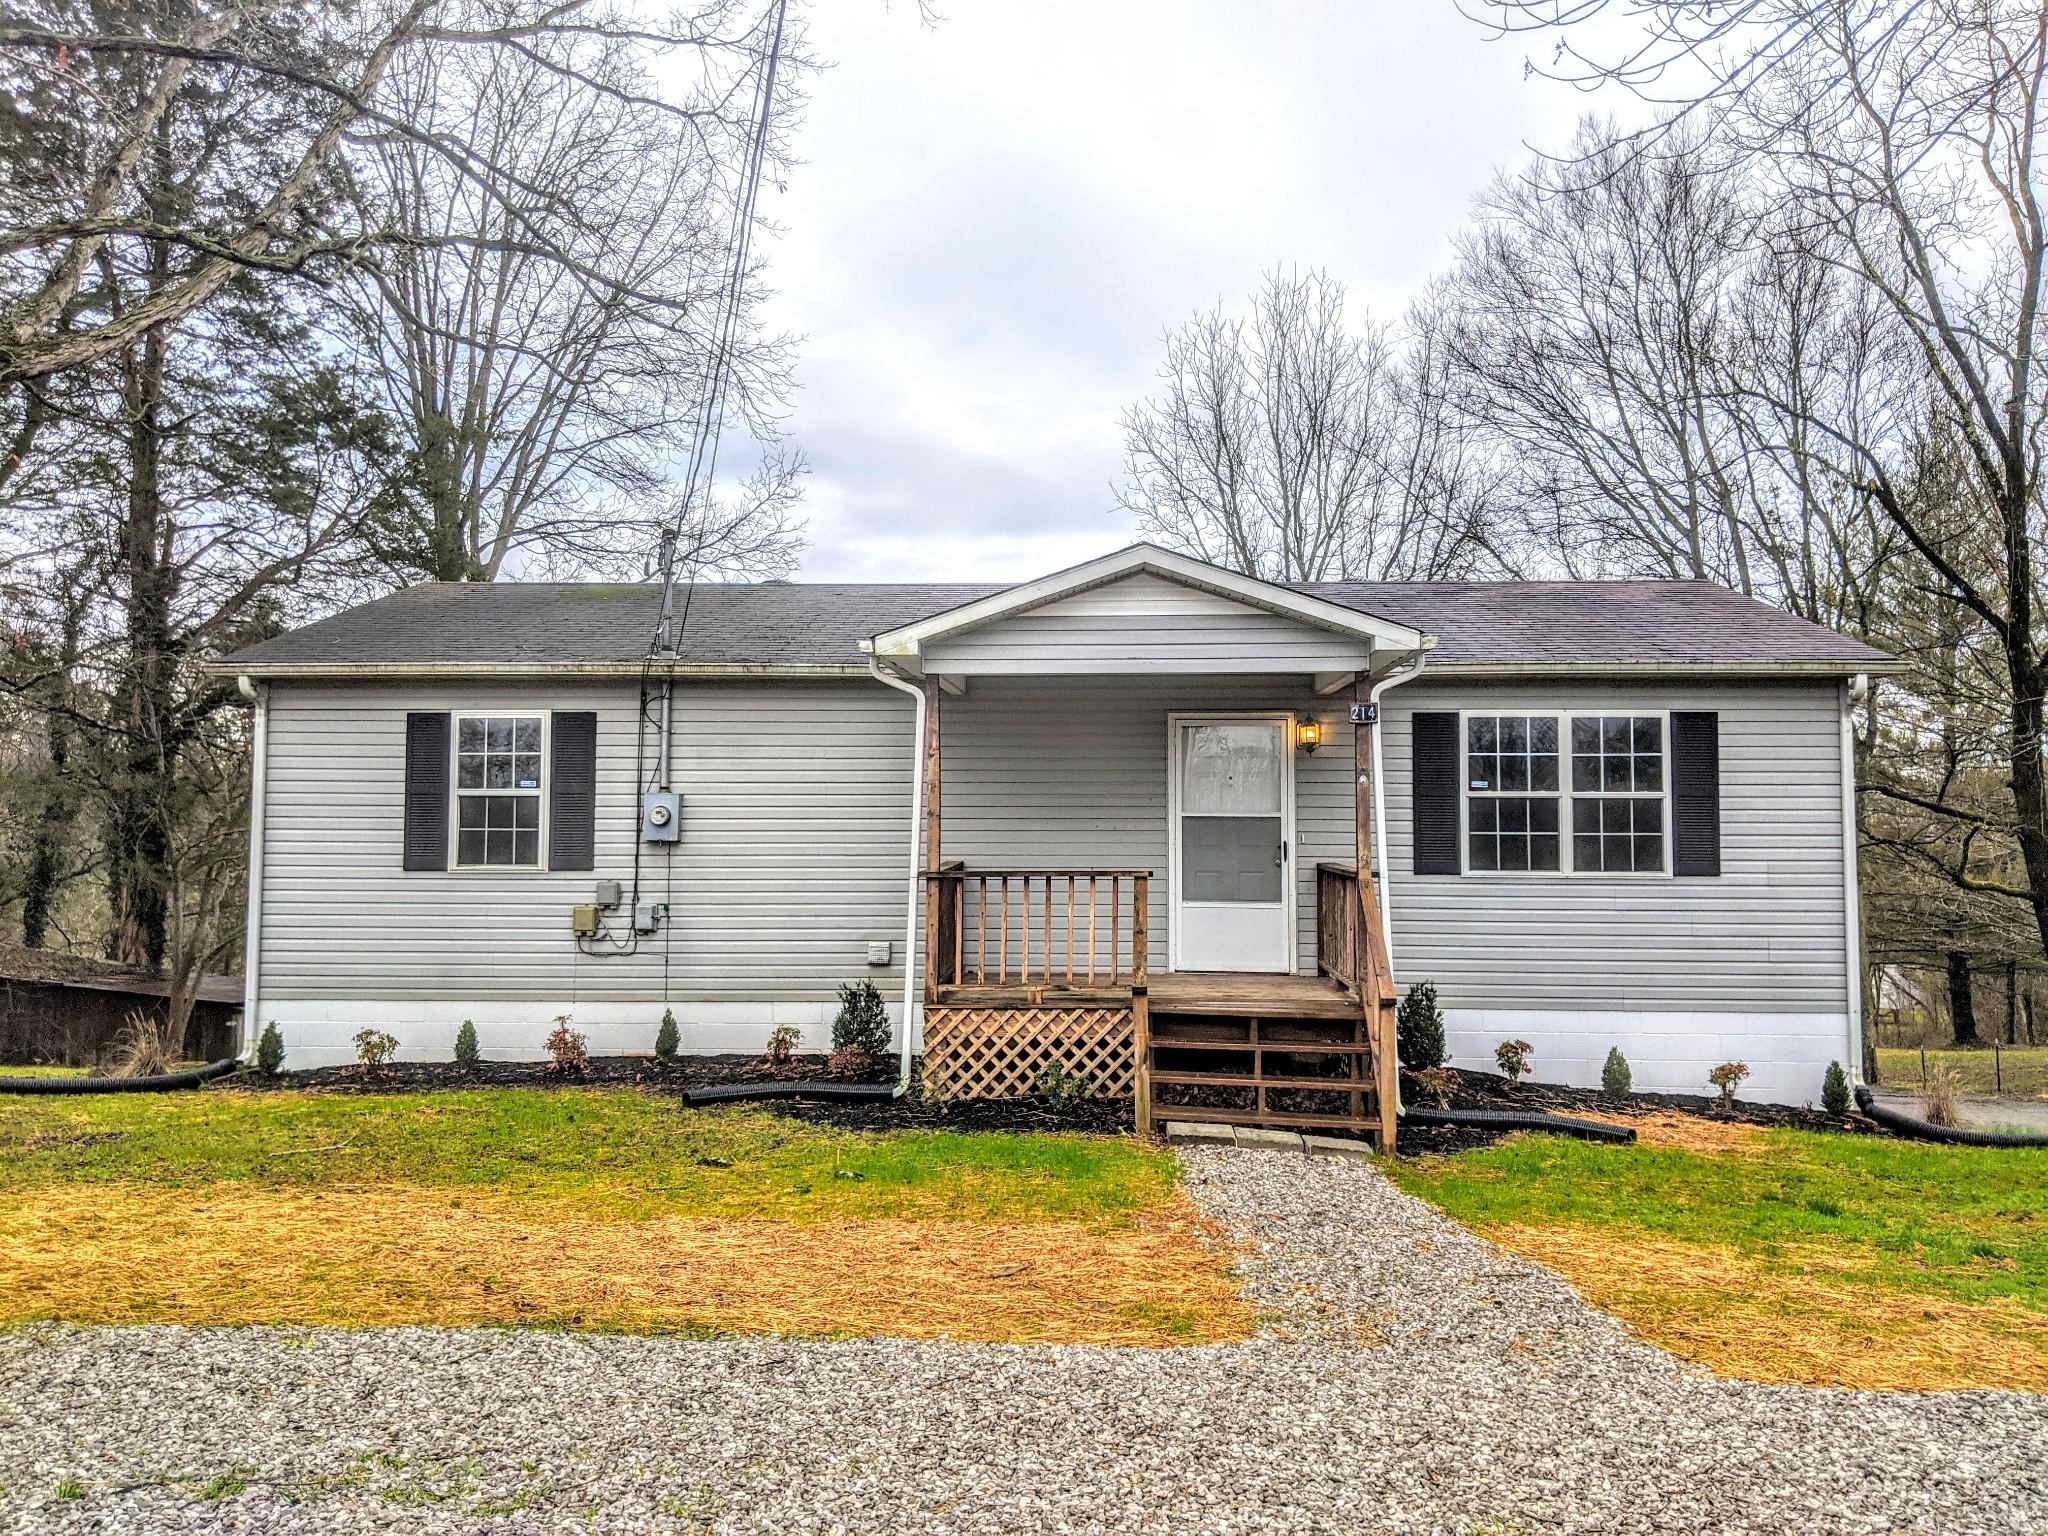 214 Higginbotham Rd, Mc Minnville, TN 37110 - Mc Minnville, TN real estate listing